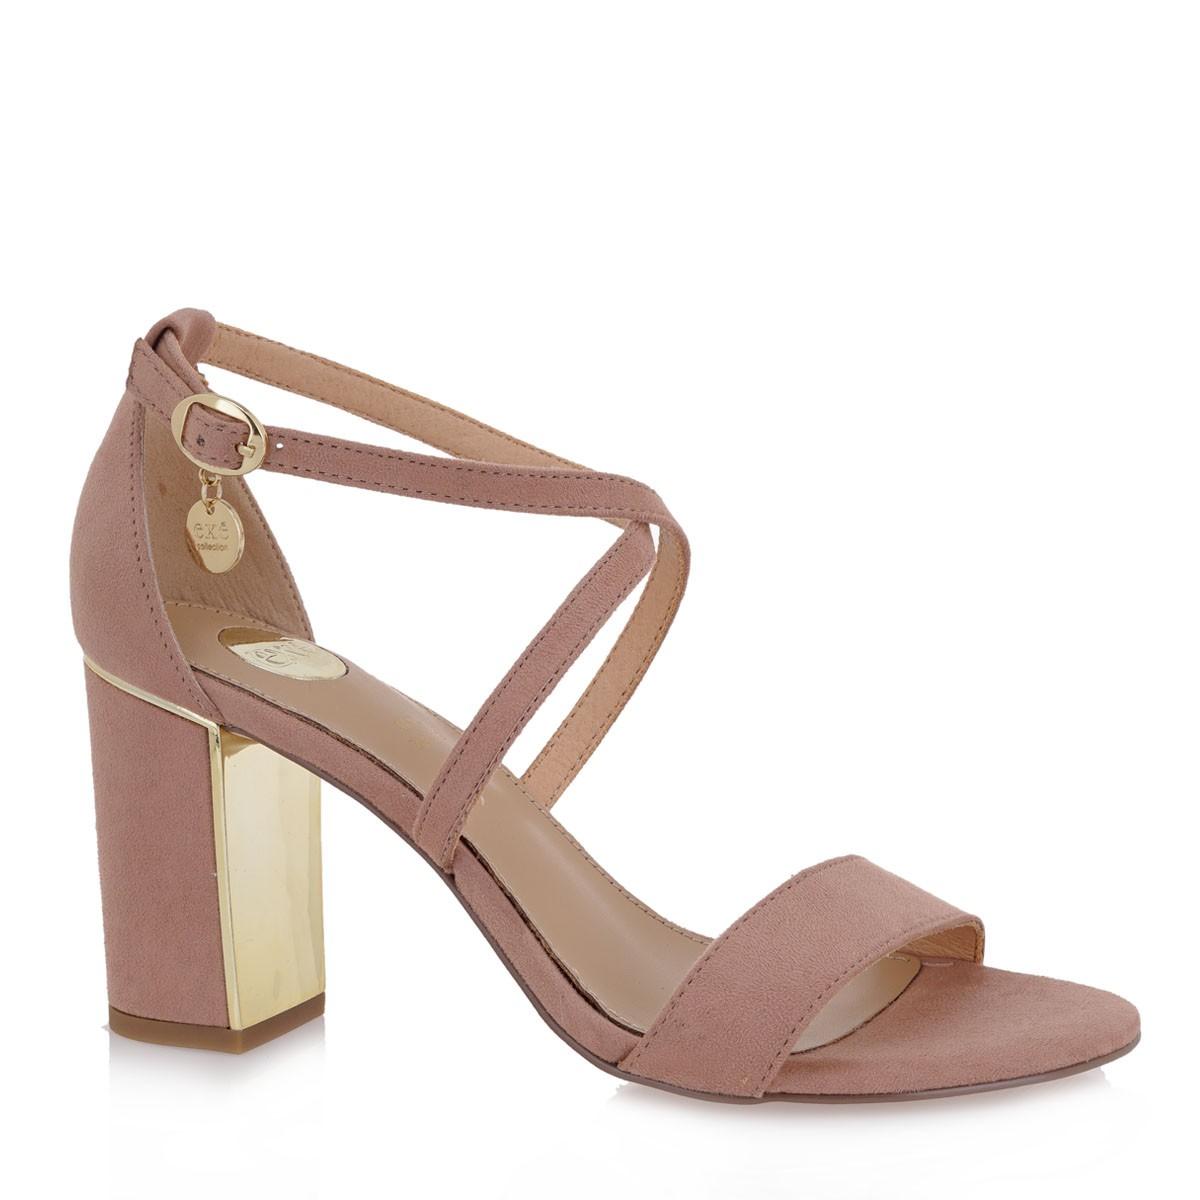 EXE Shoes Πέδιλα Γυναικεία ROMINA-903 Nude Καστόρι K4700903471D